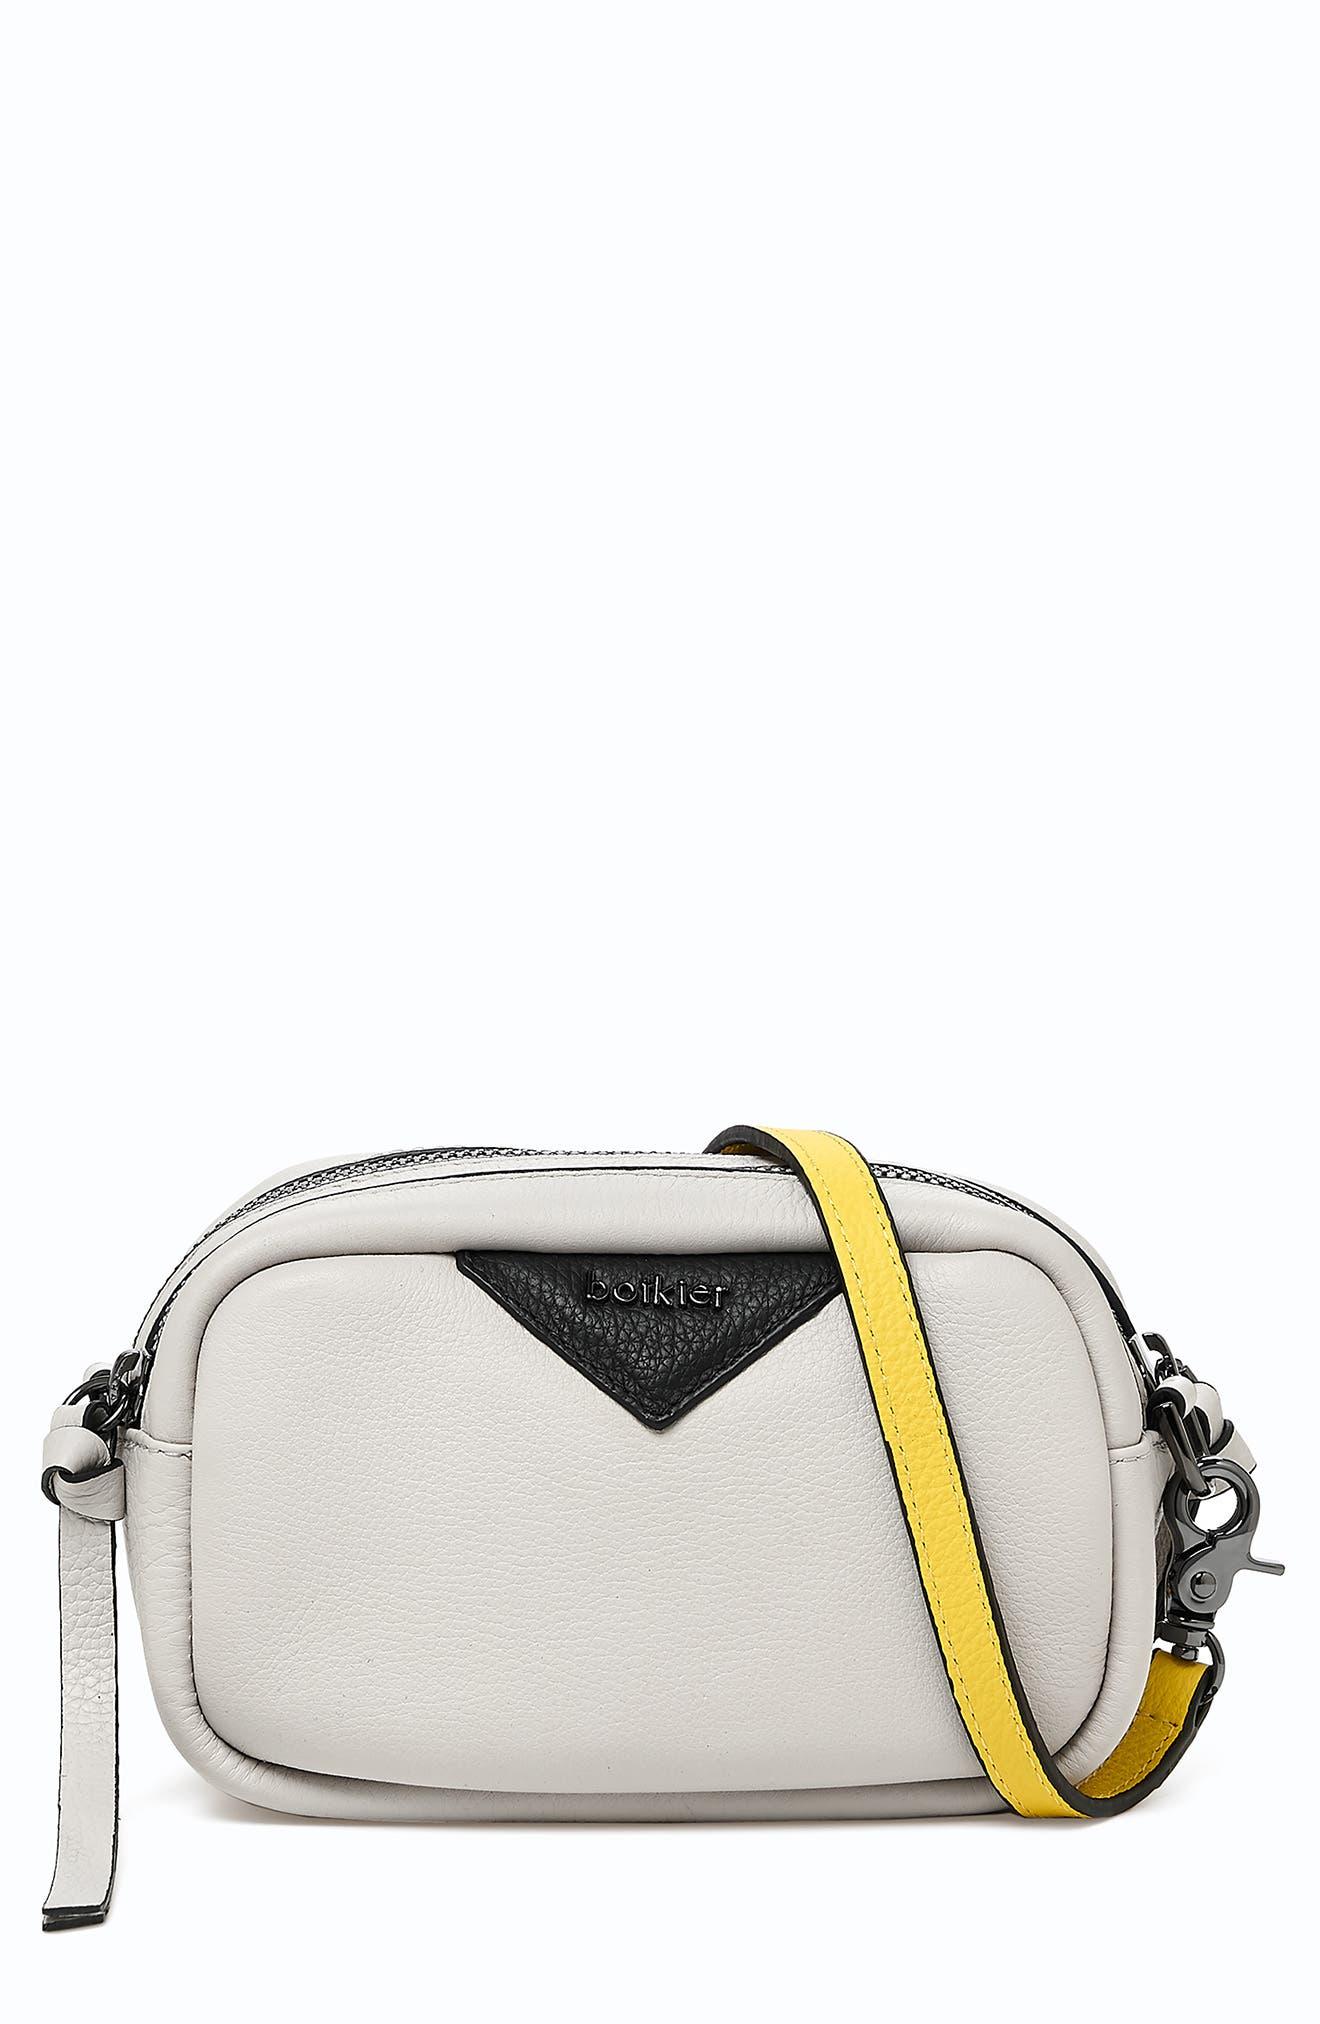 Allen Leather Crossbody Camera Bag